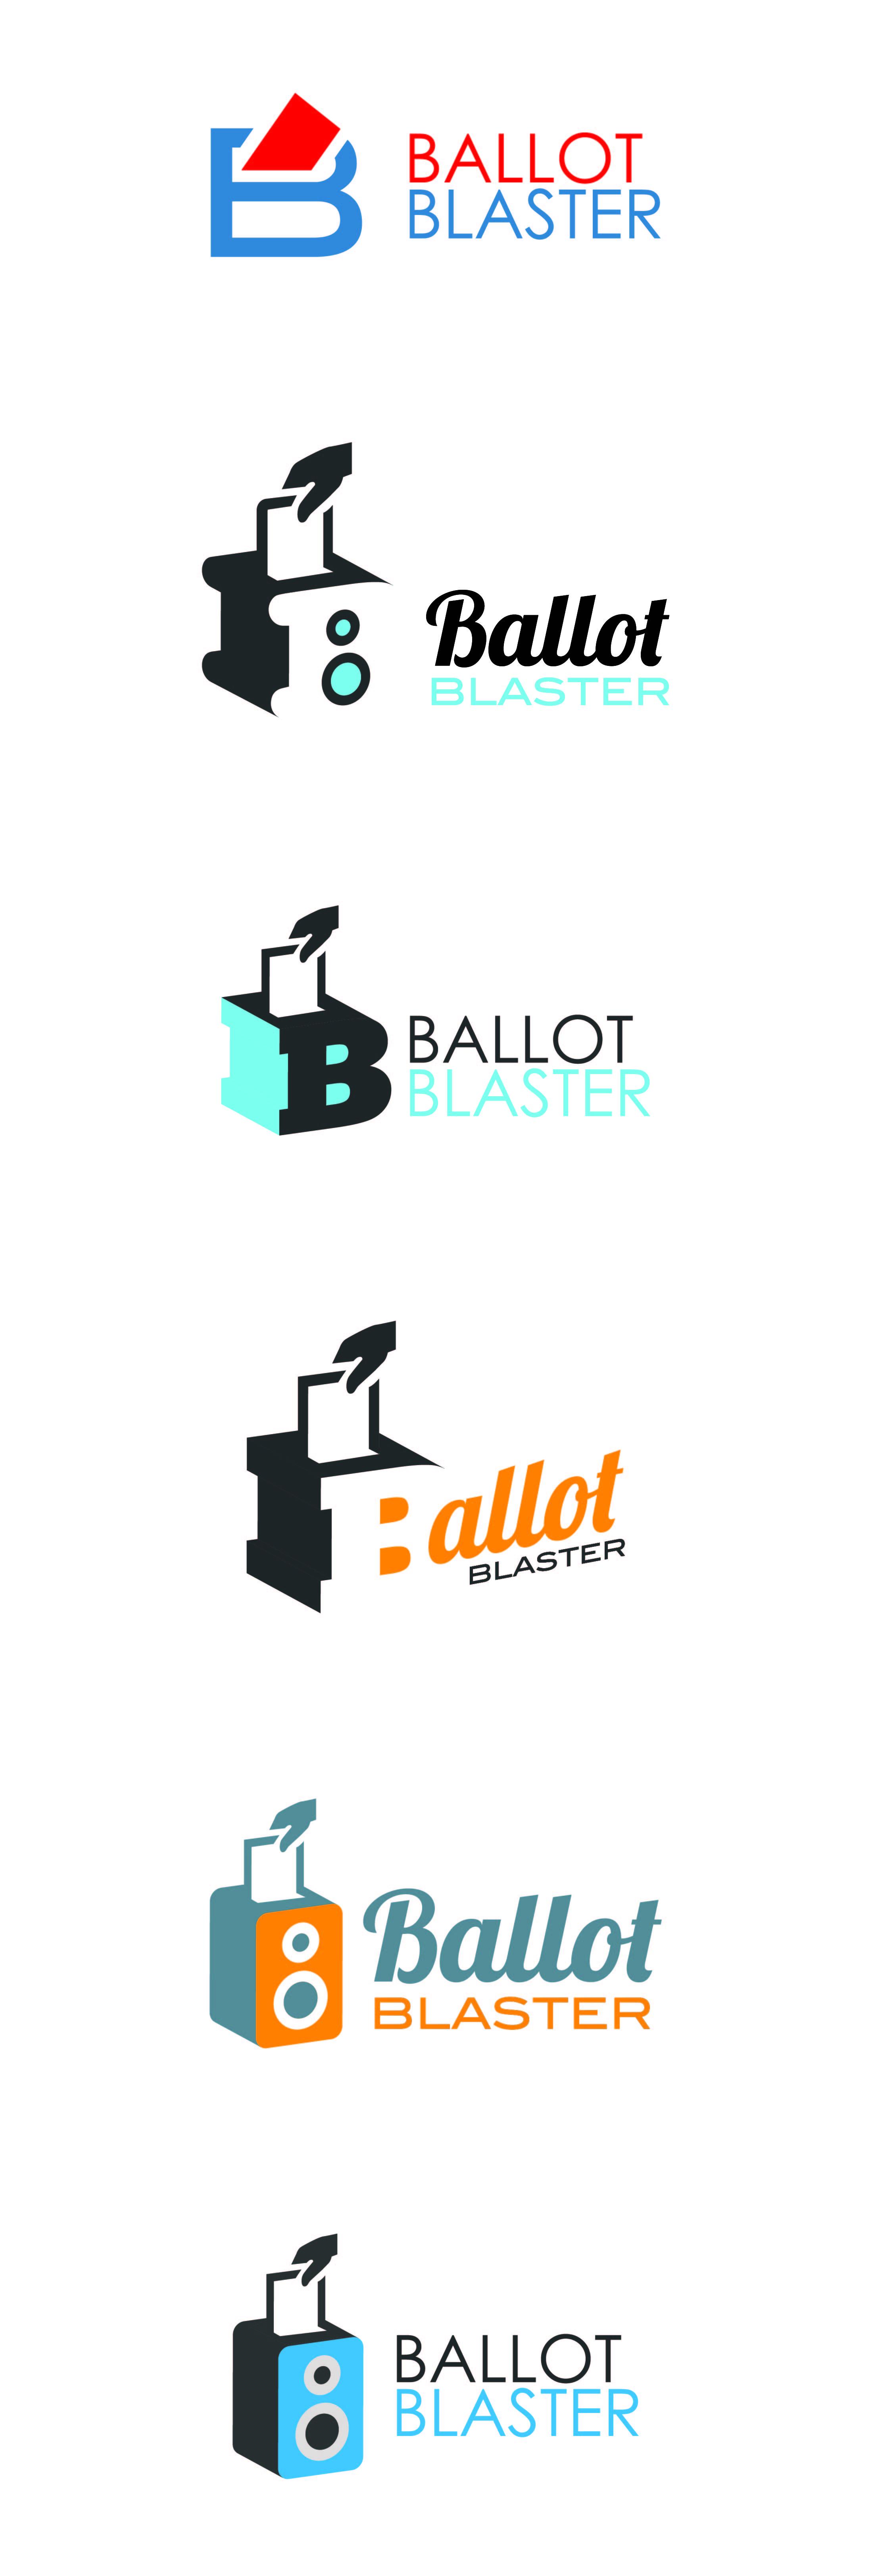 BallotBlaster-logos-01